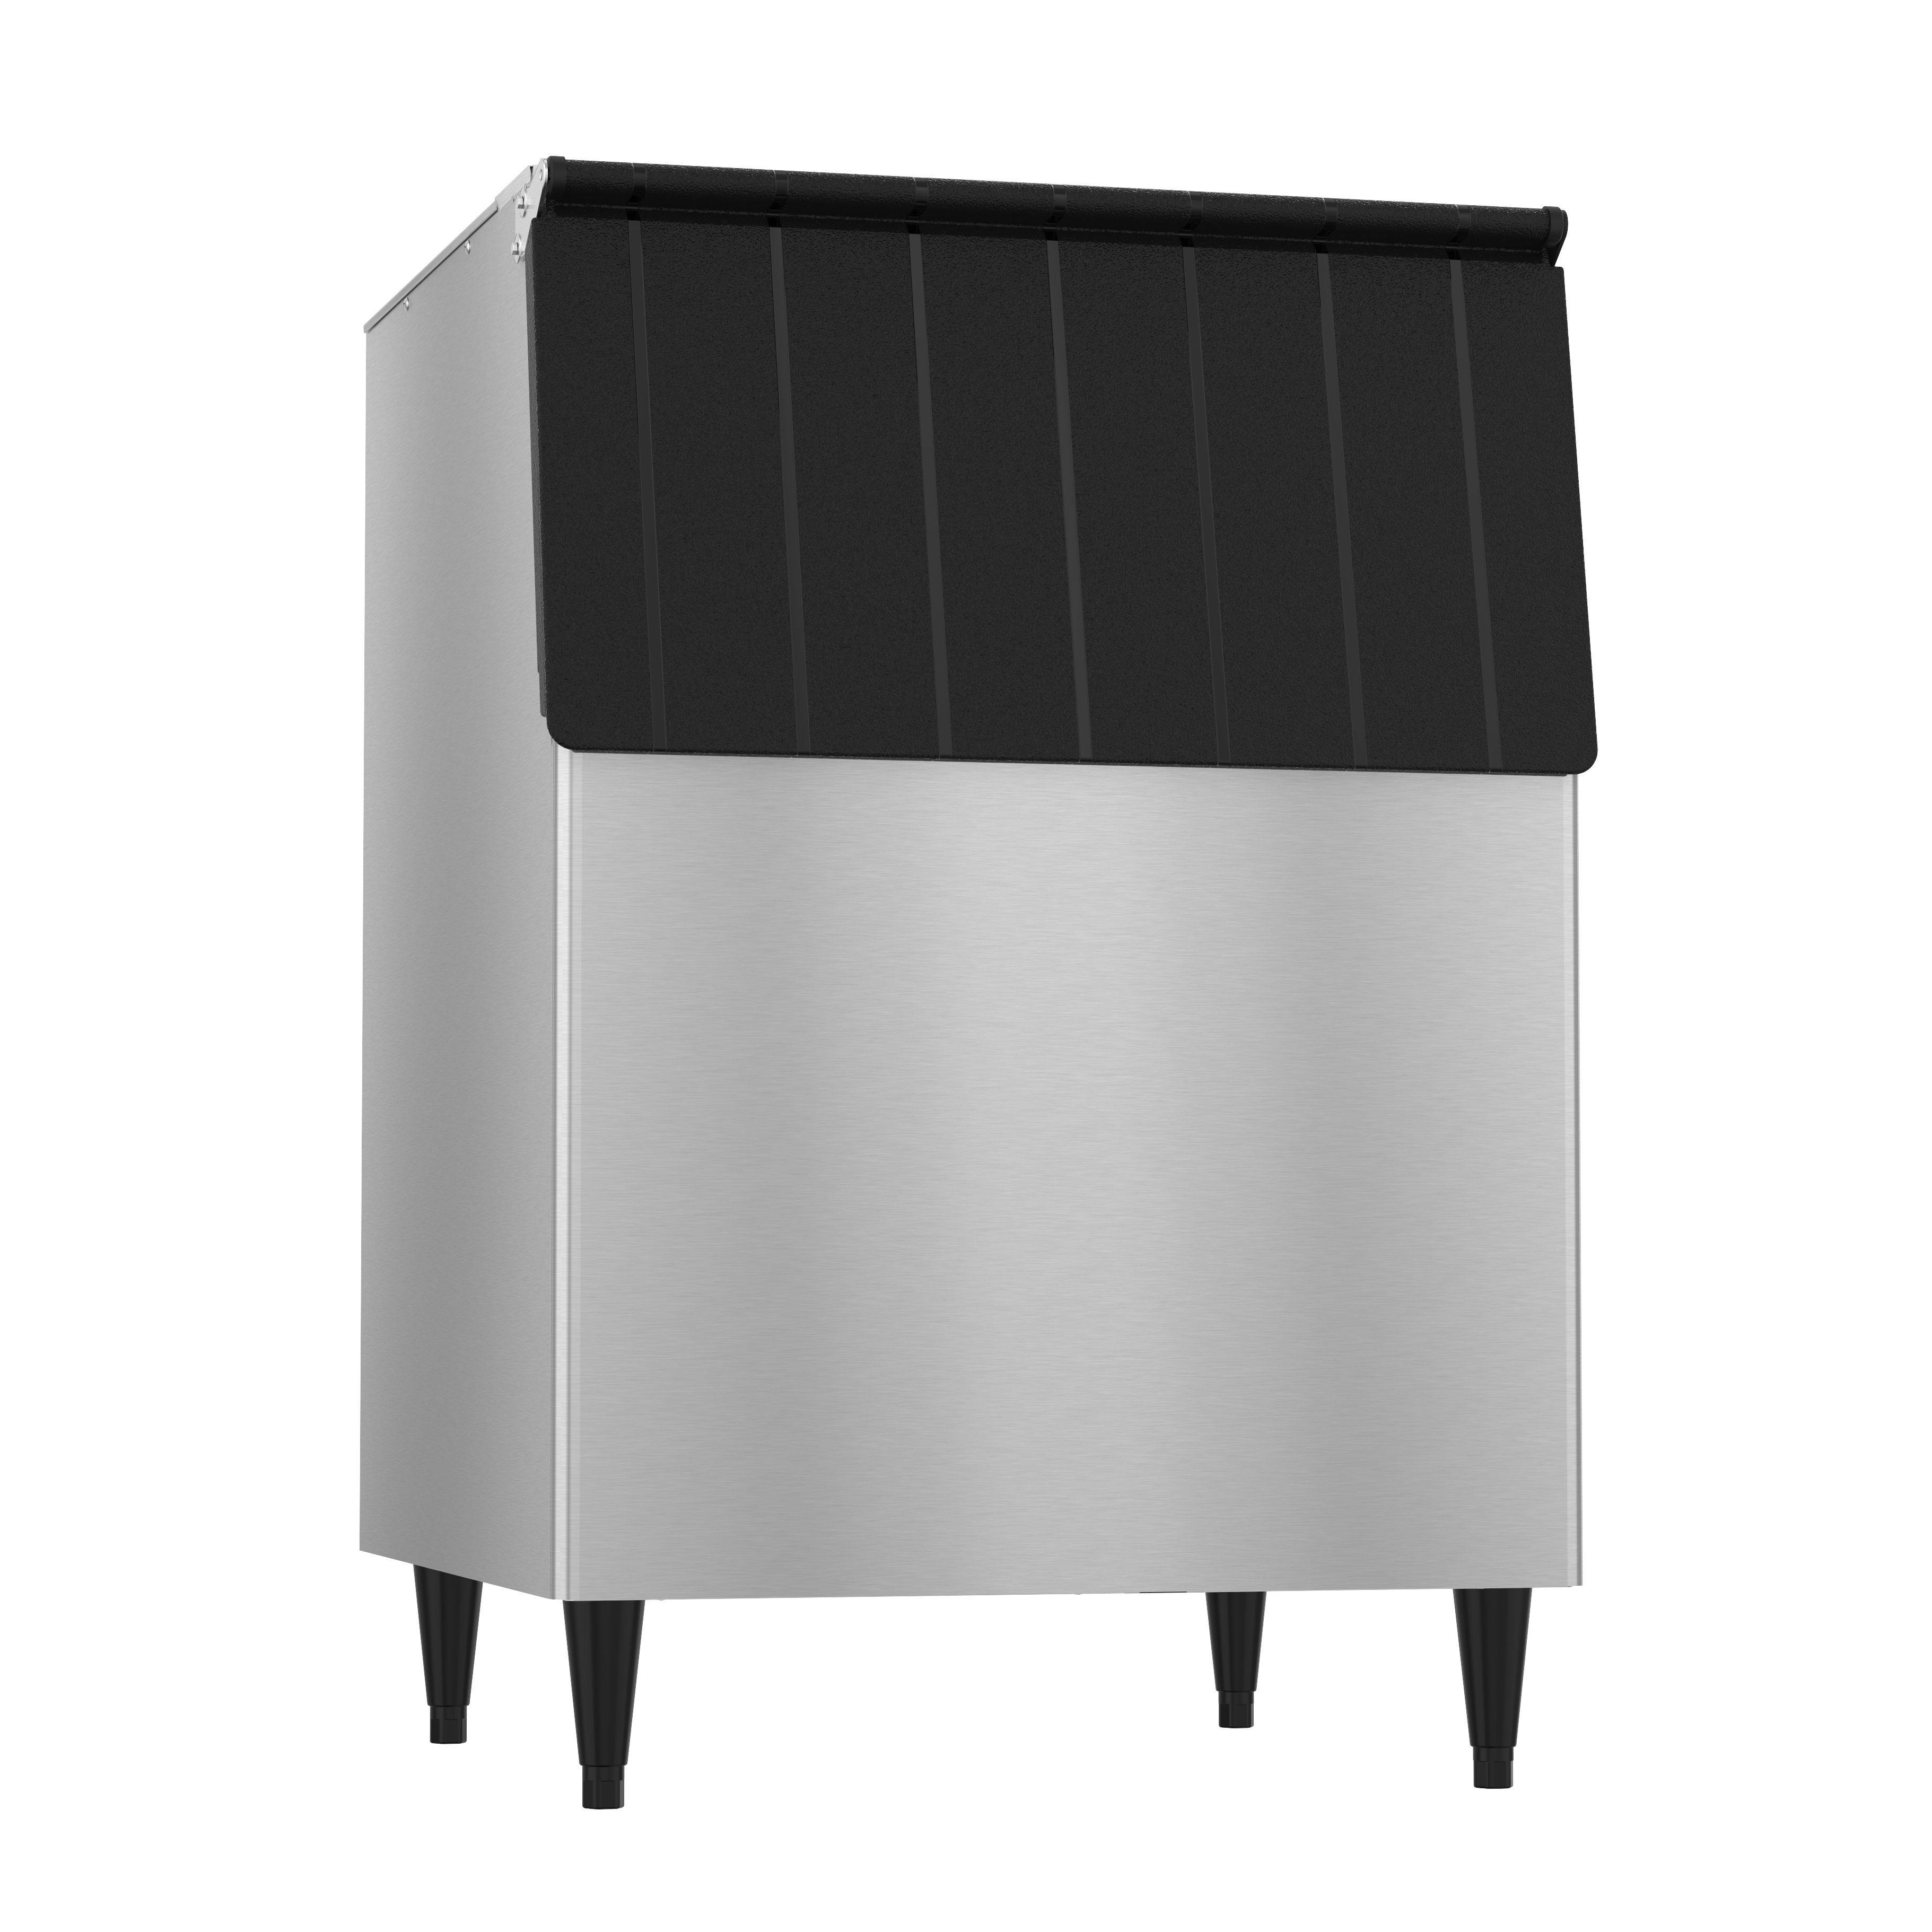 Hoshizaki BD-500SF ice cubers, ice storage & ice dispensers